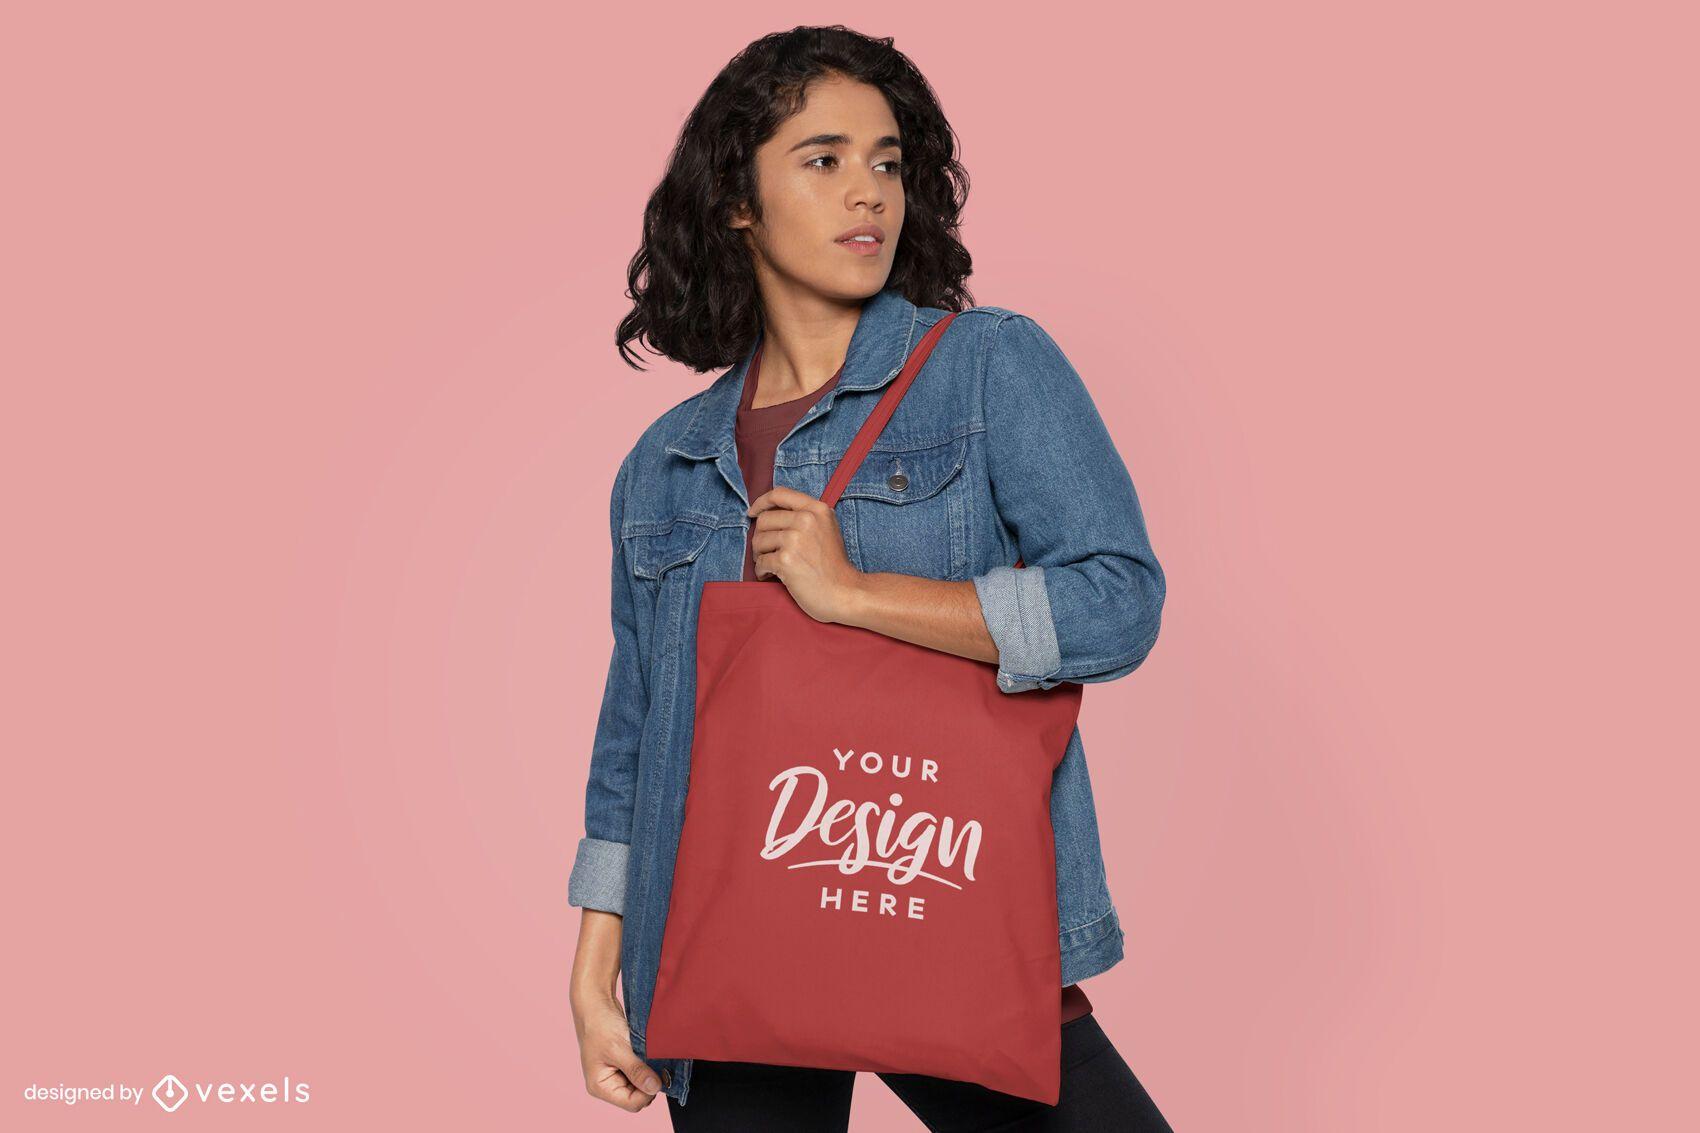 Short-haired woman tote bag mockup